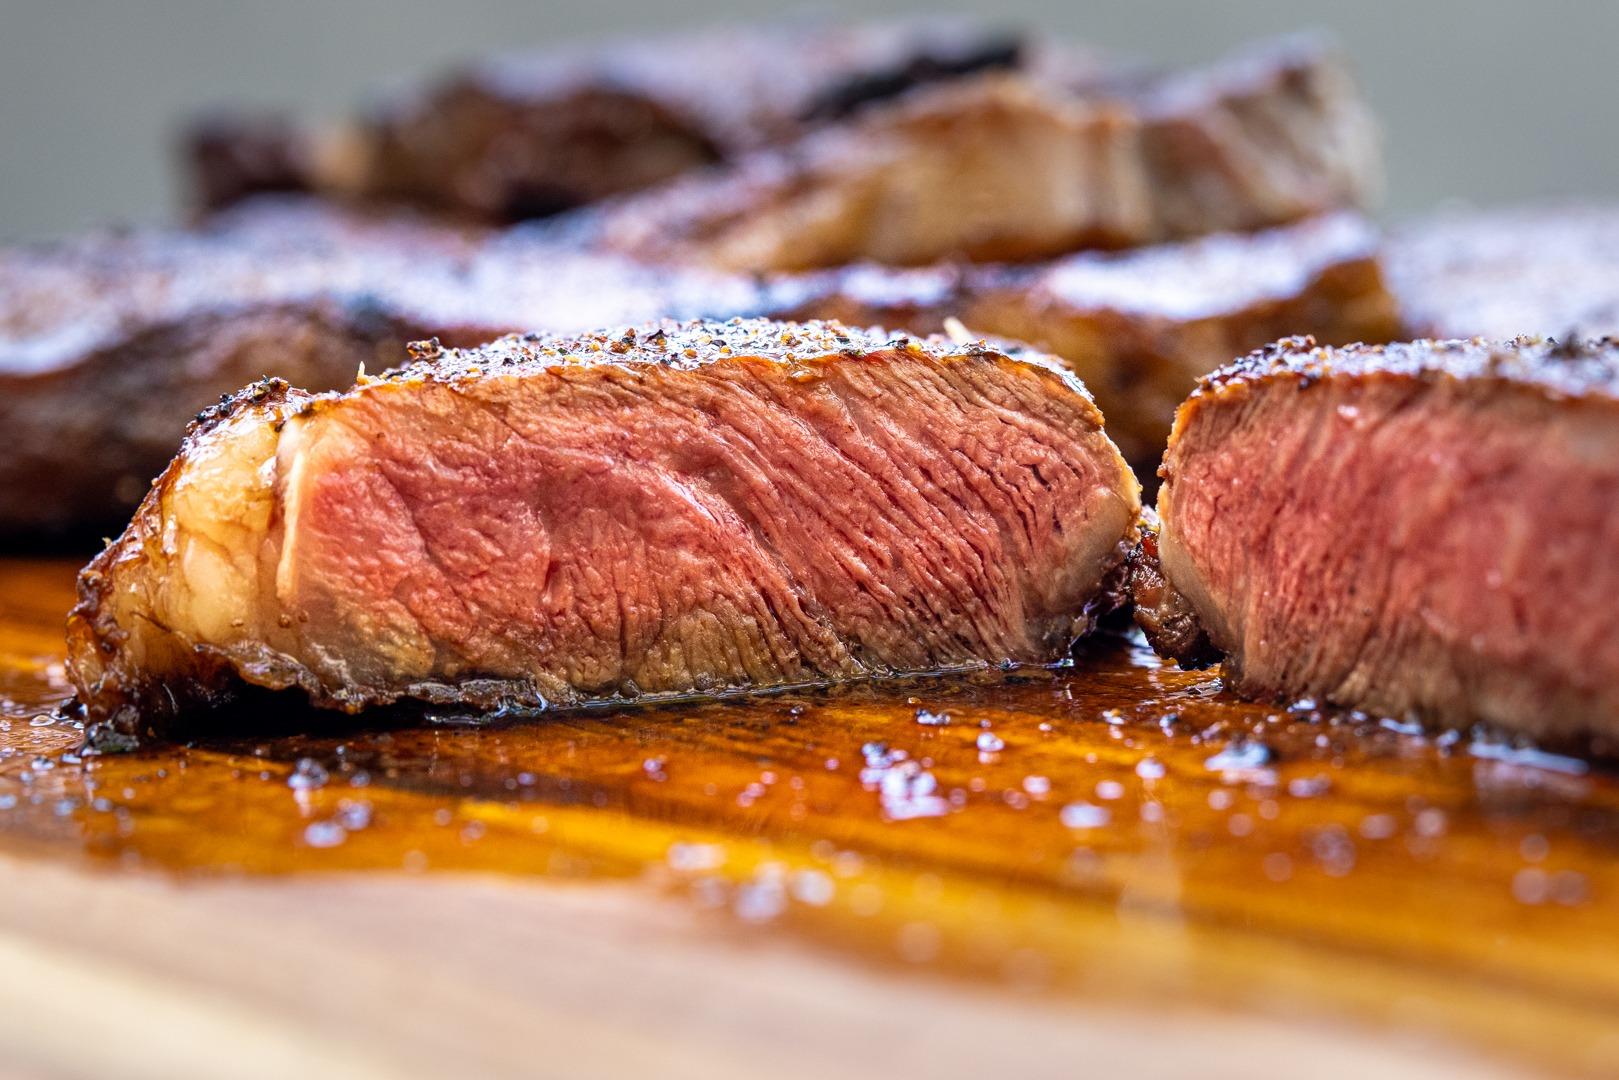 Juicy, tender steak, perfectly temped to medium rare